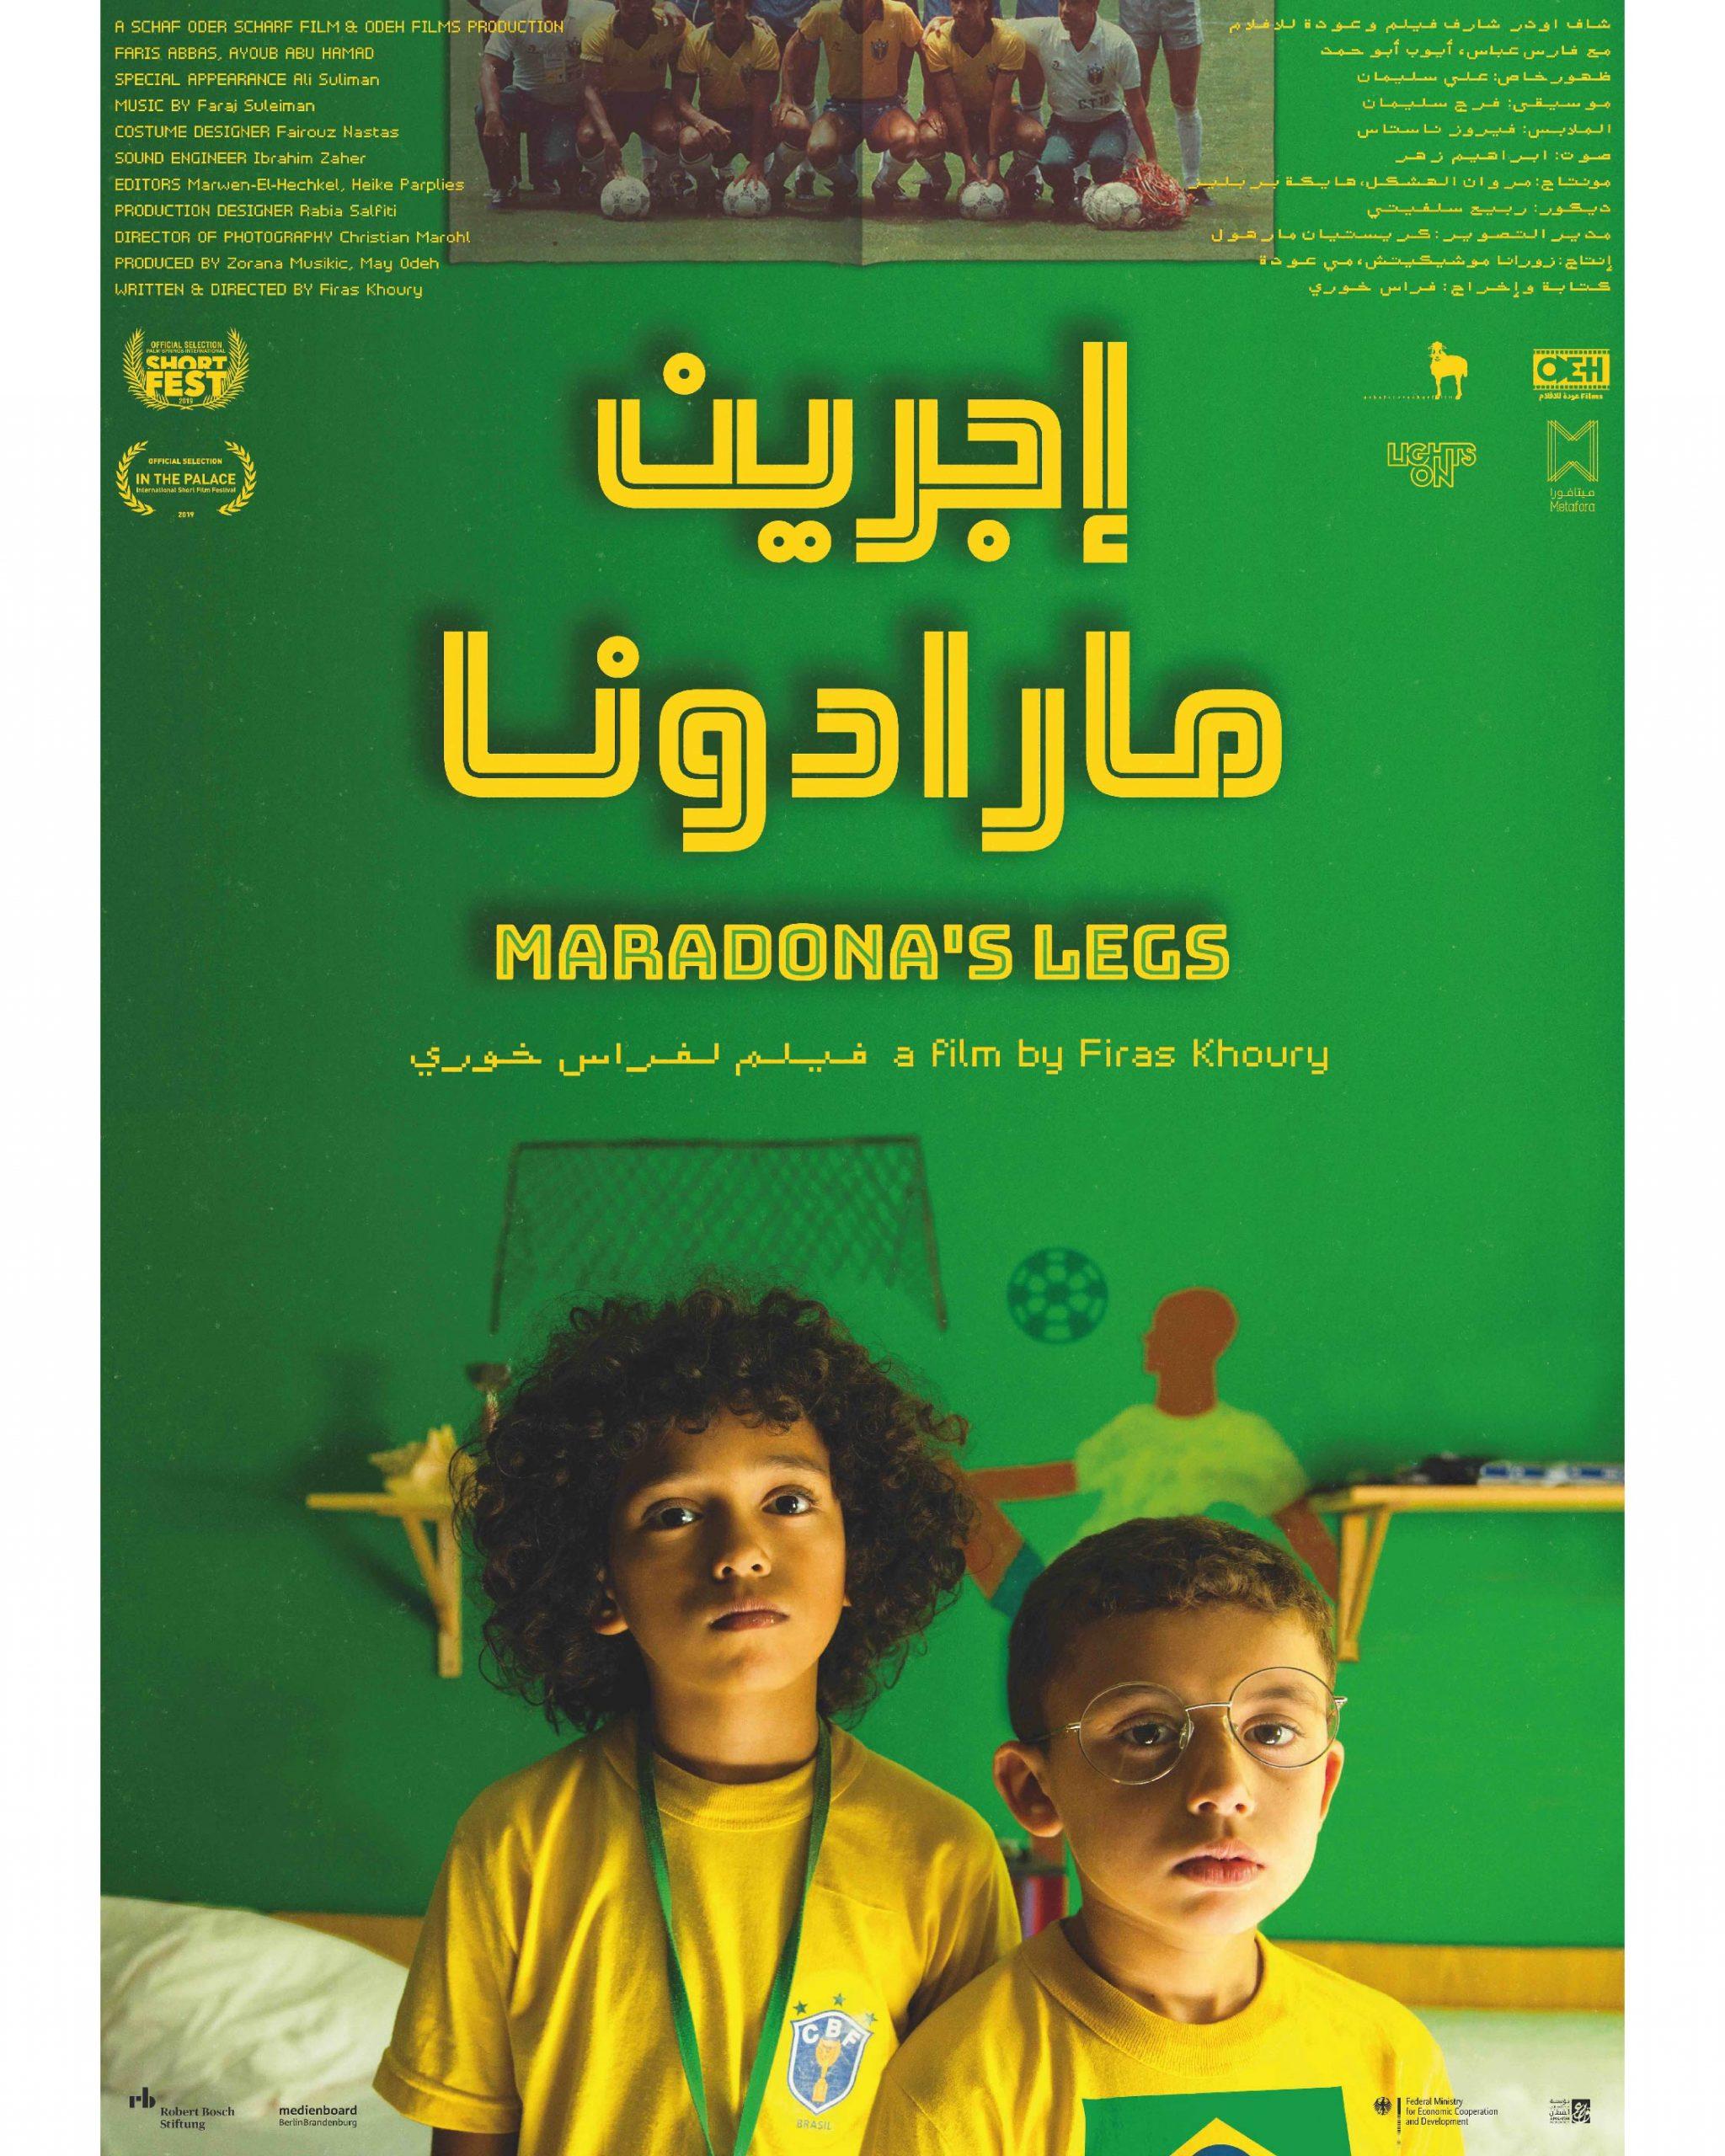 hexagon film festival maradonas legs